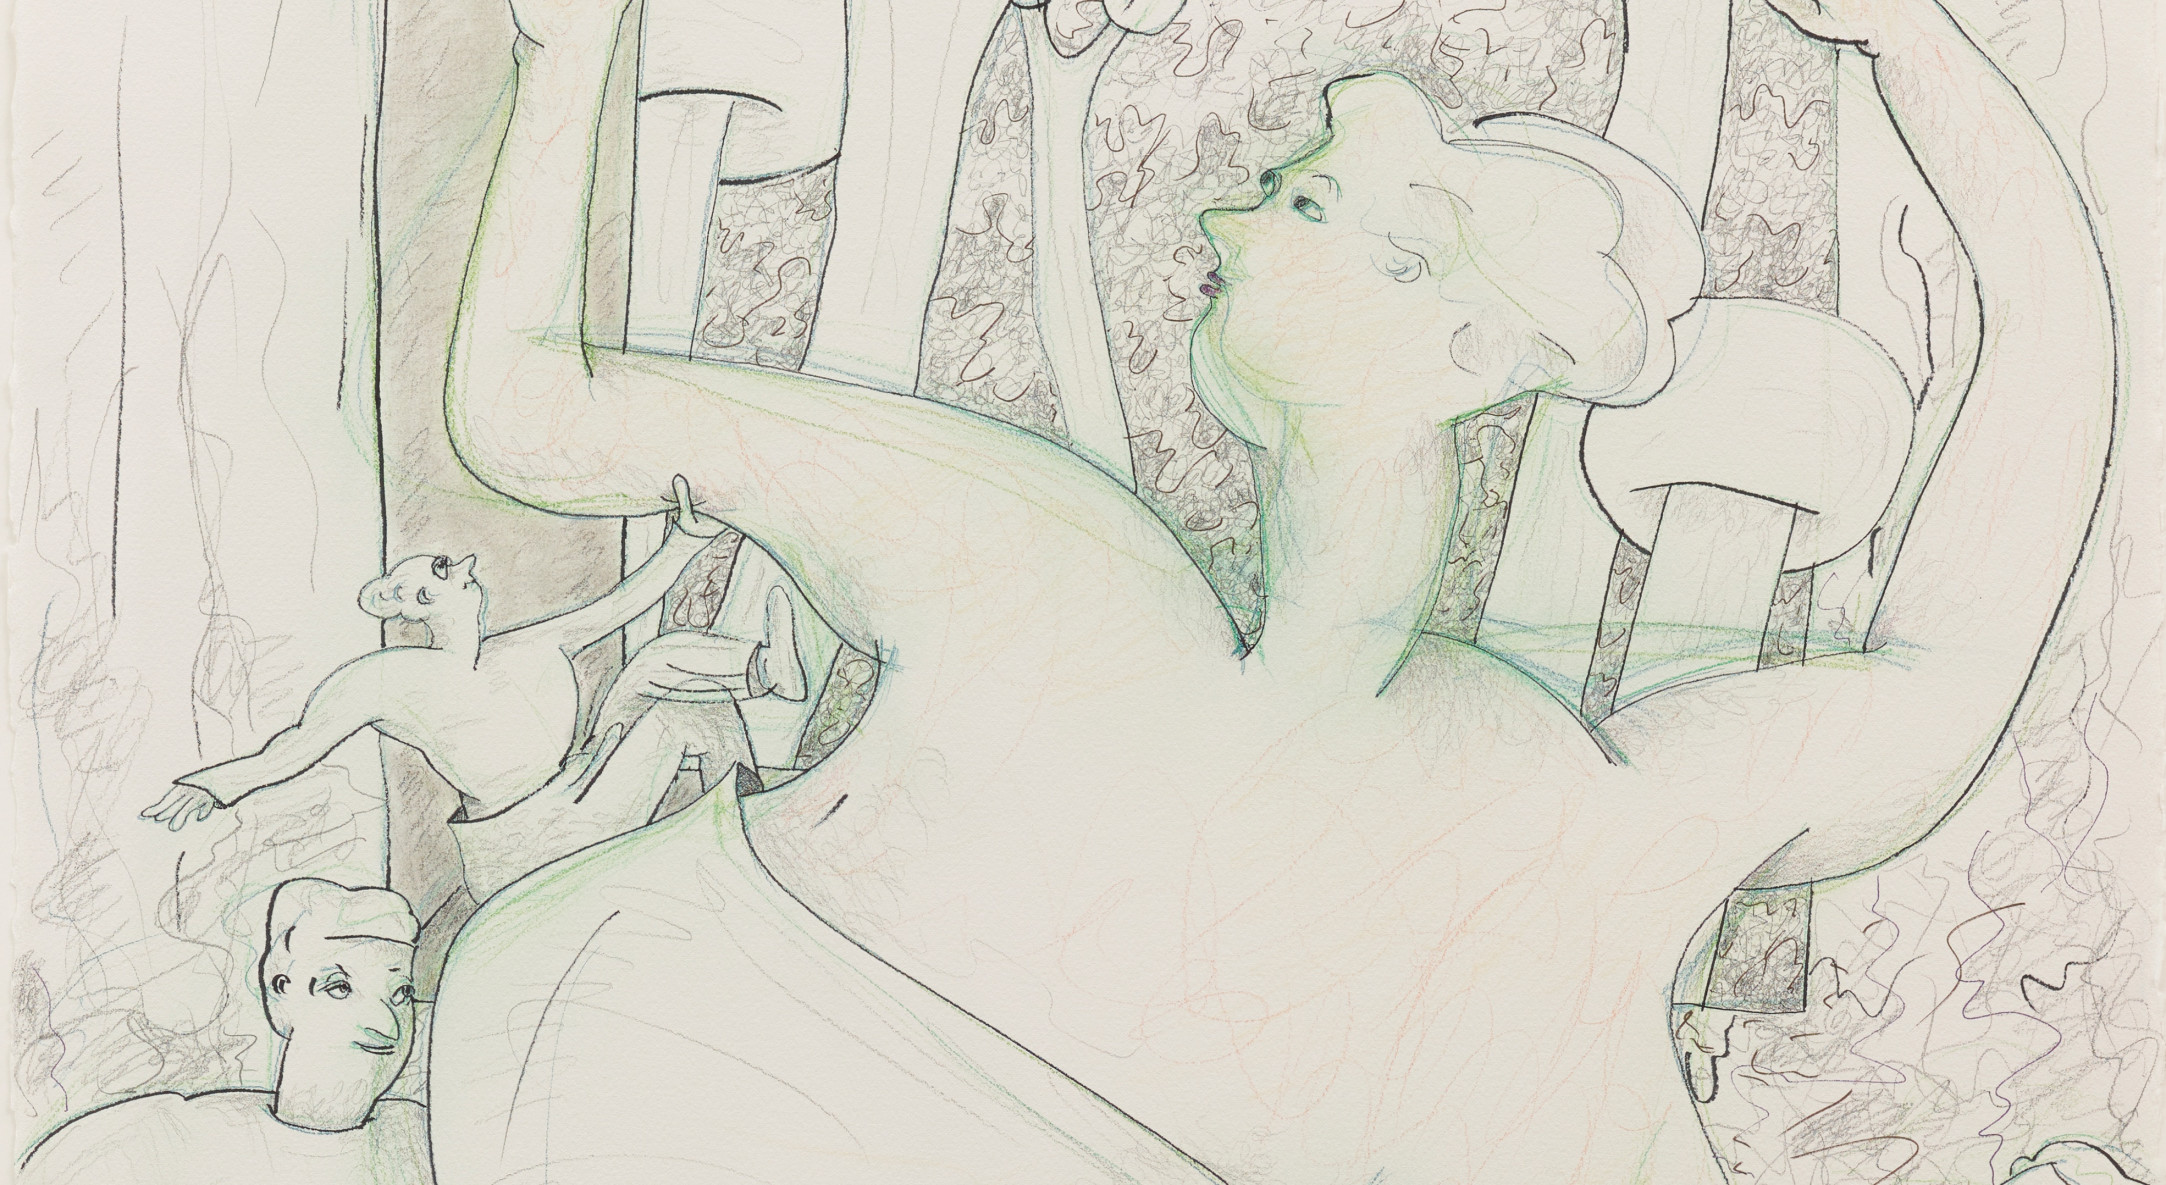 Detail of Gladys Nilsson, A Window #3, 2014